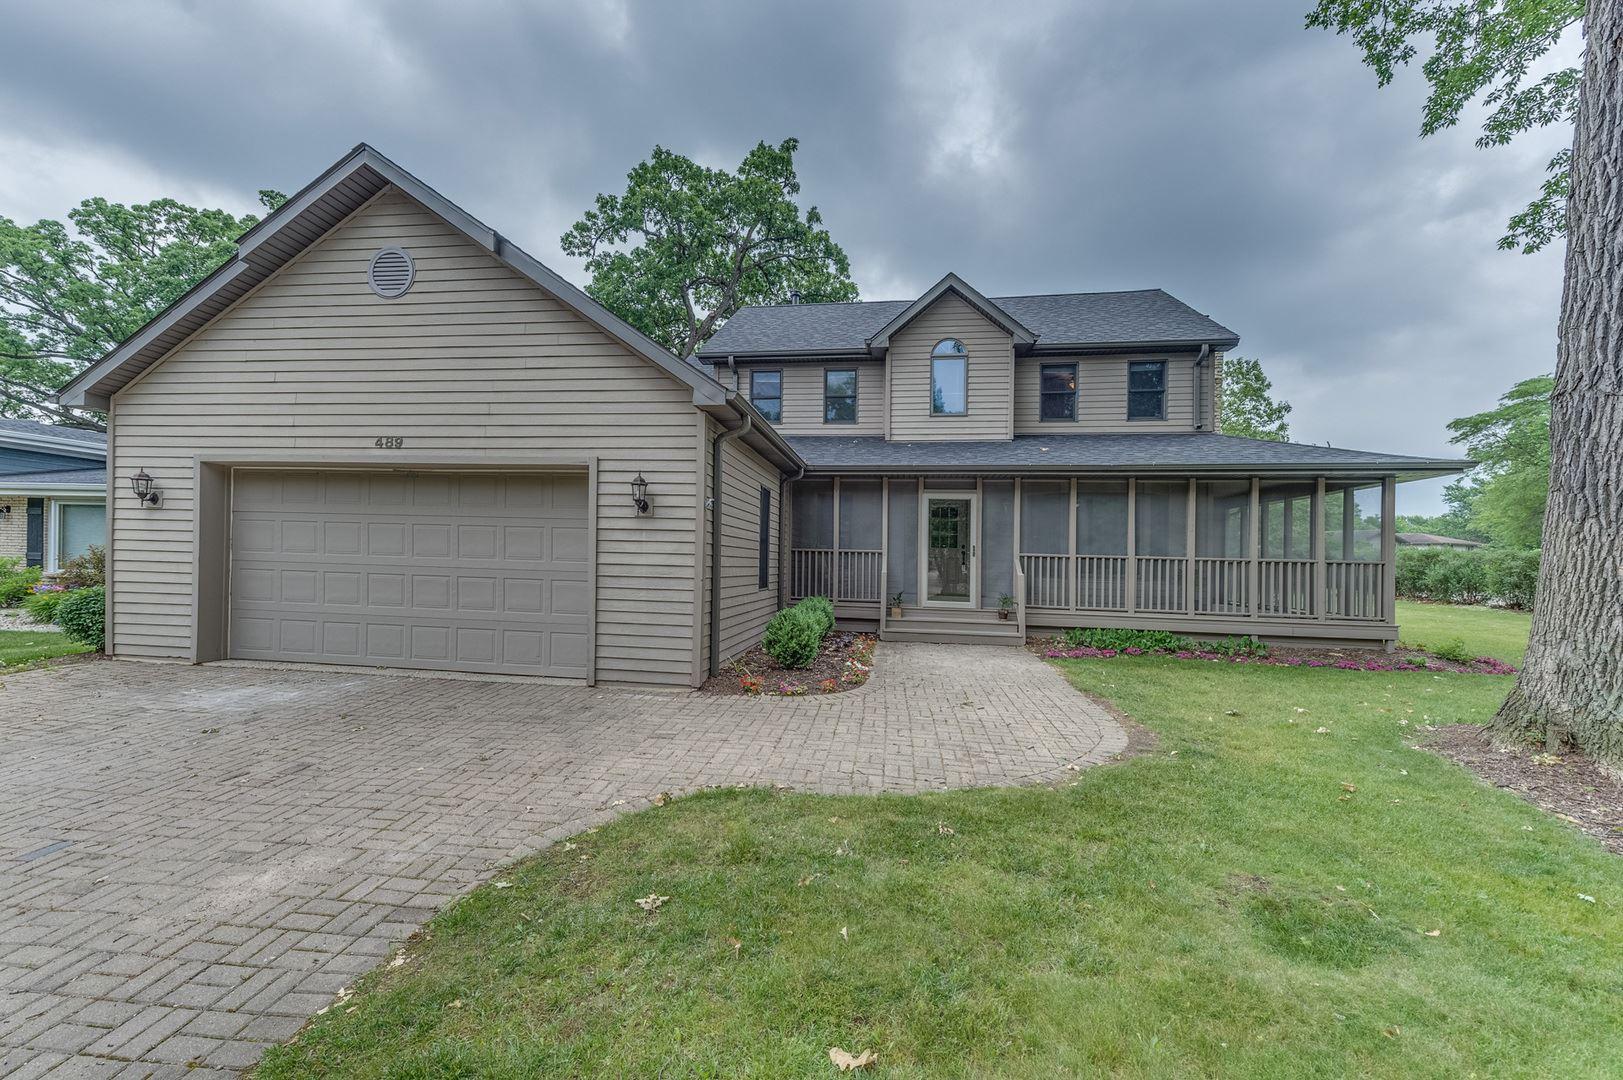 489 Cedar Lane, Frankfort, IL 60423 - #: 10759152